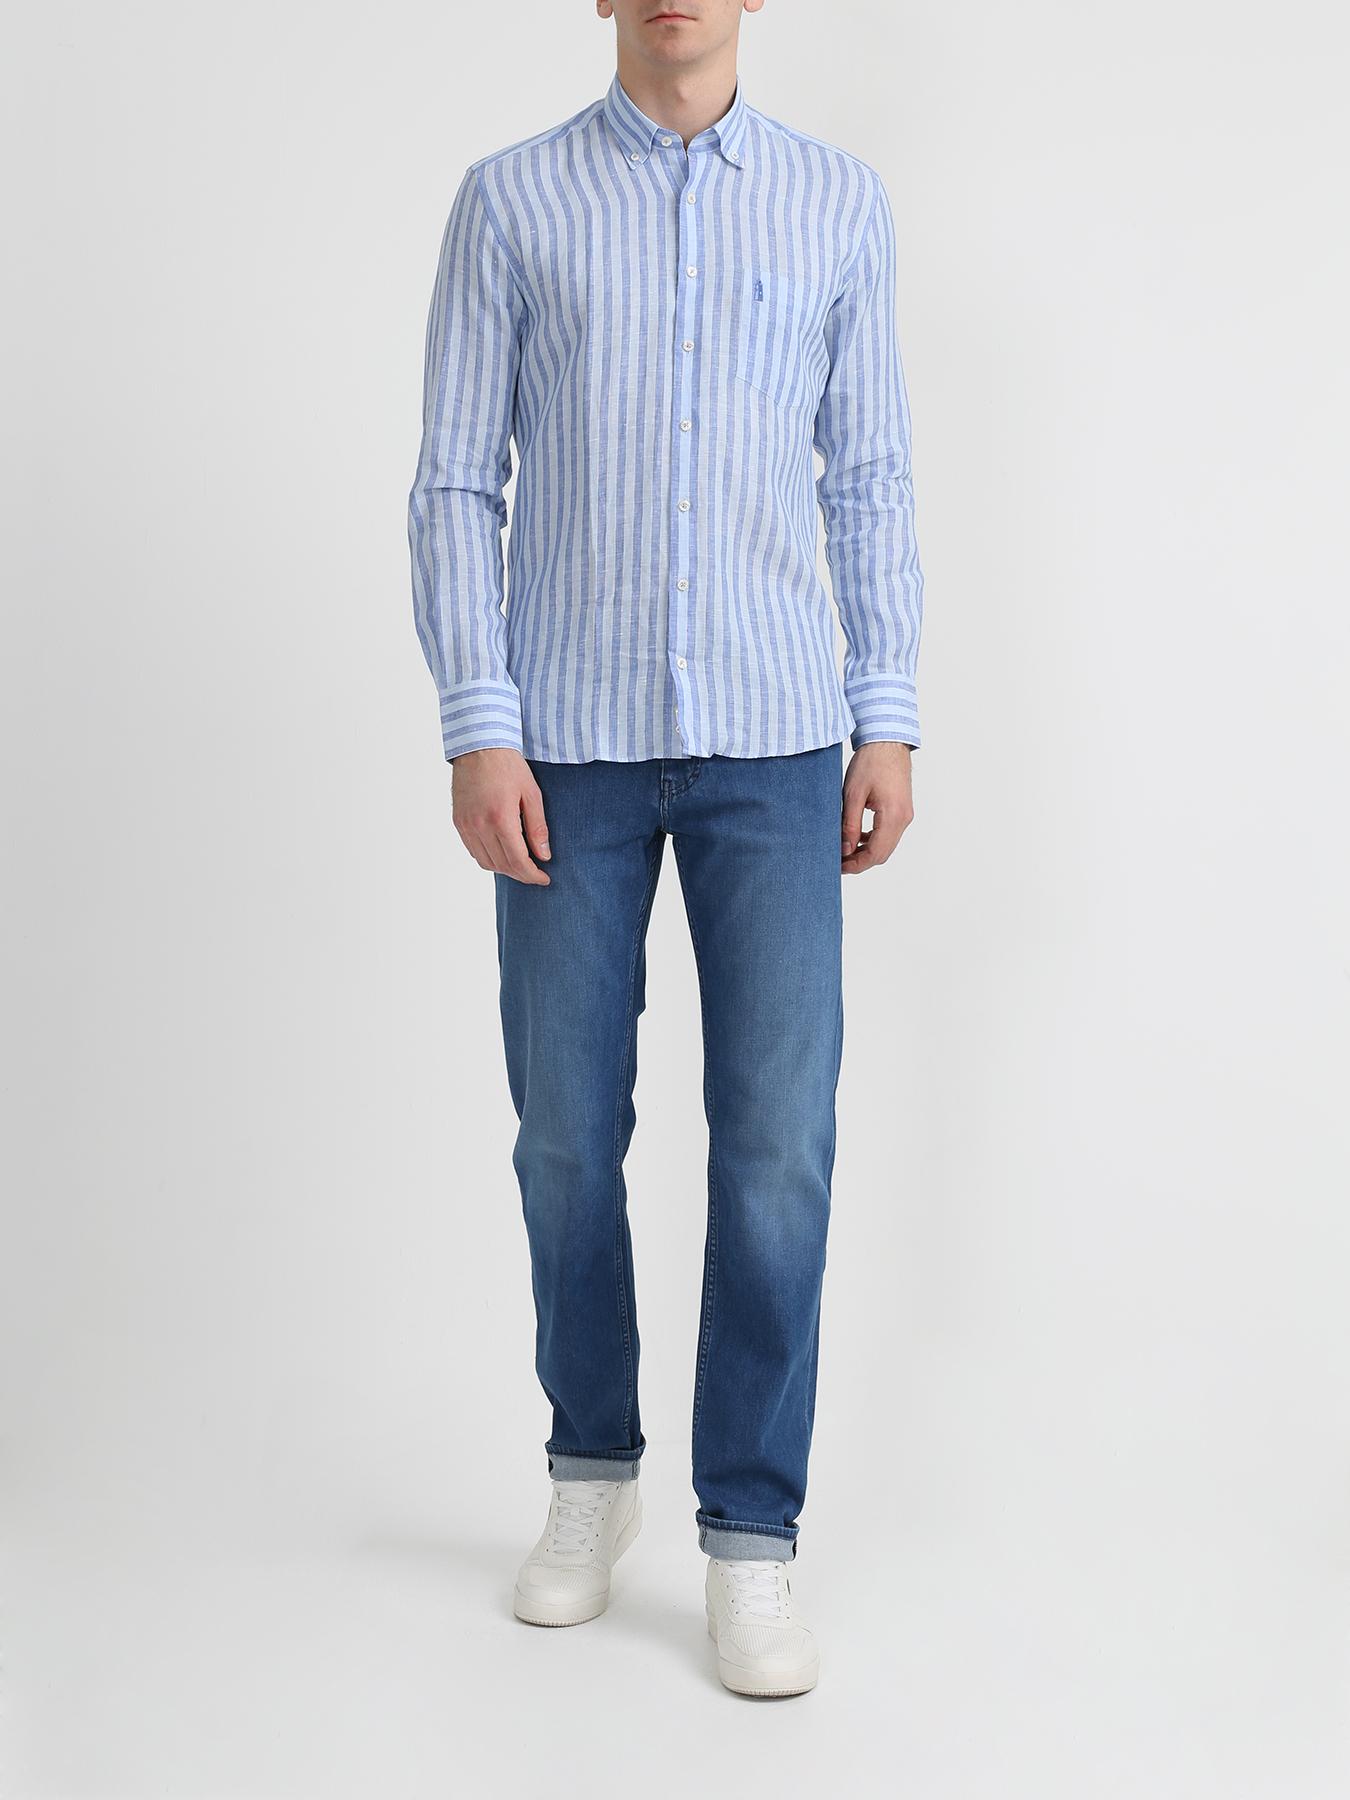 Рубашка Finisterre Льняная рубашка в полоску